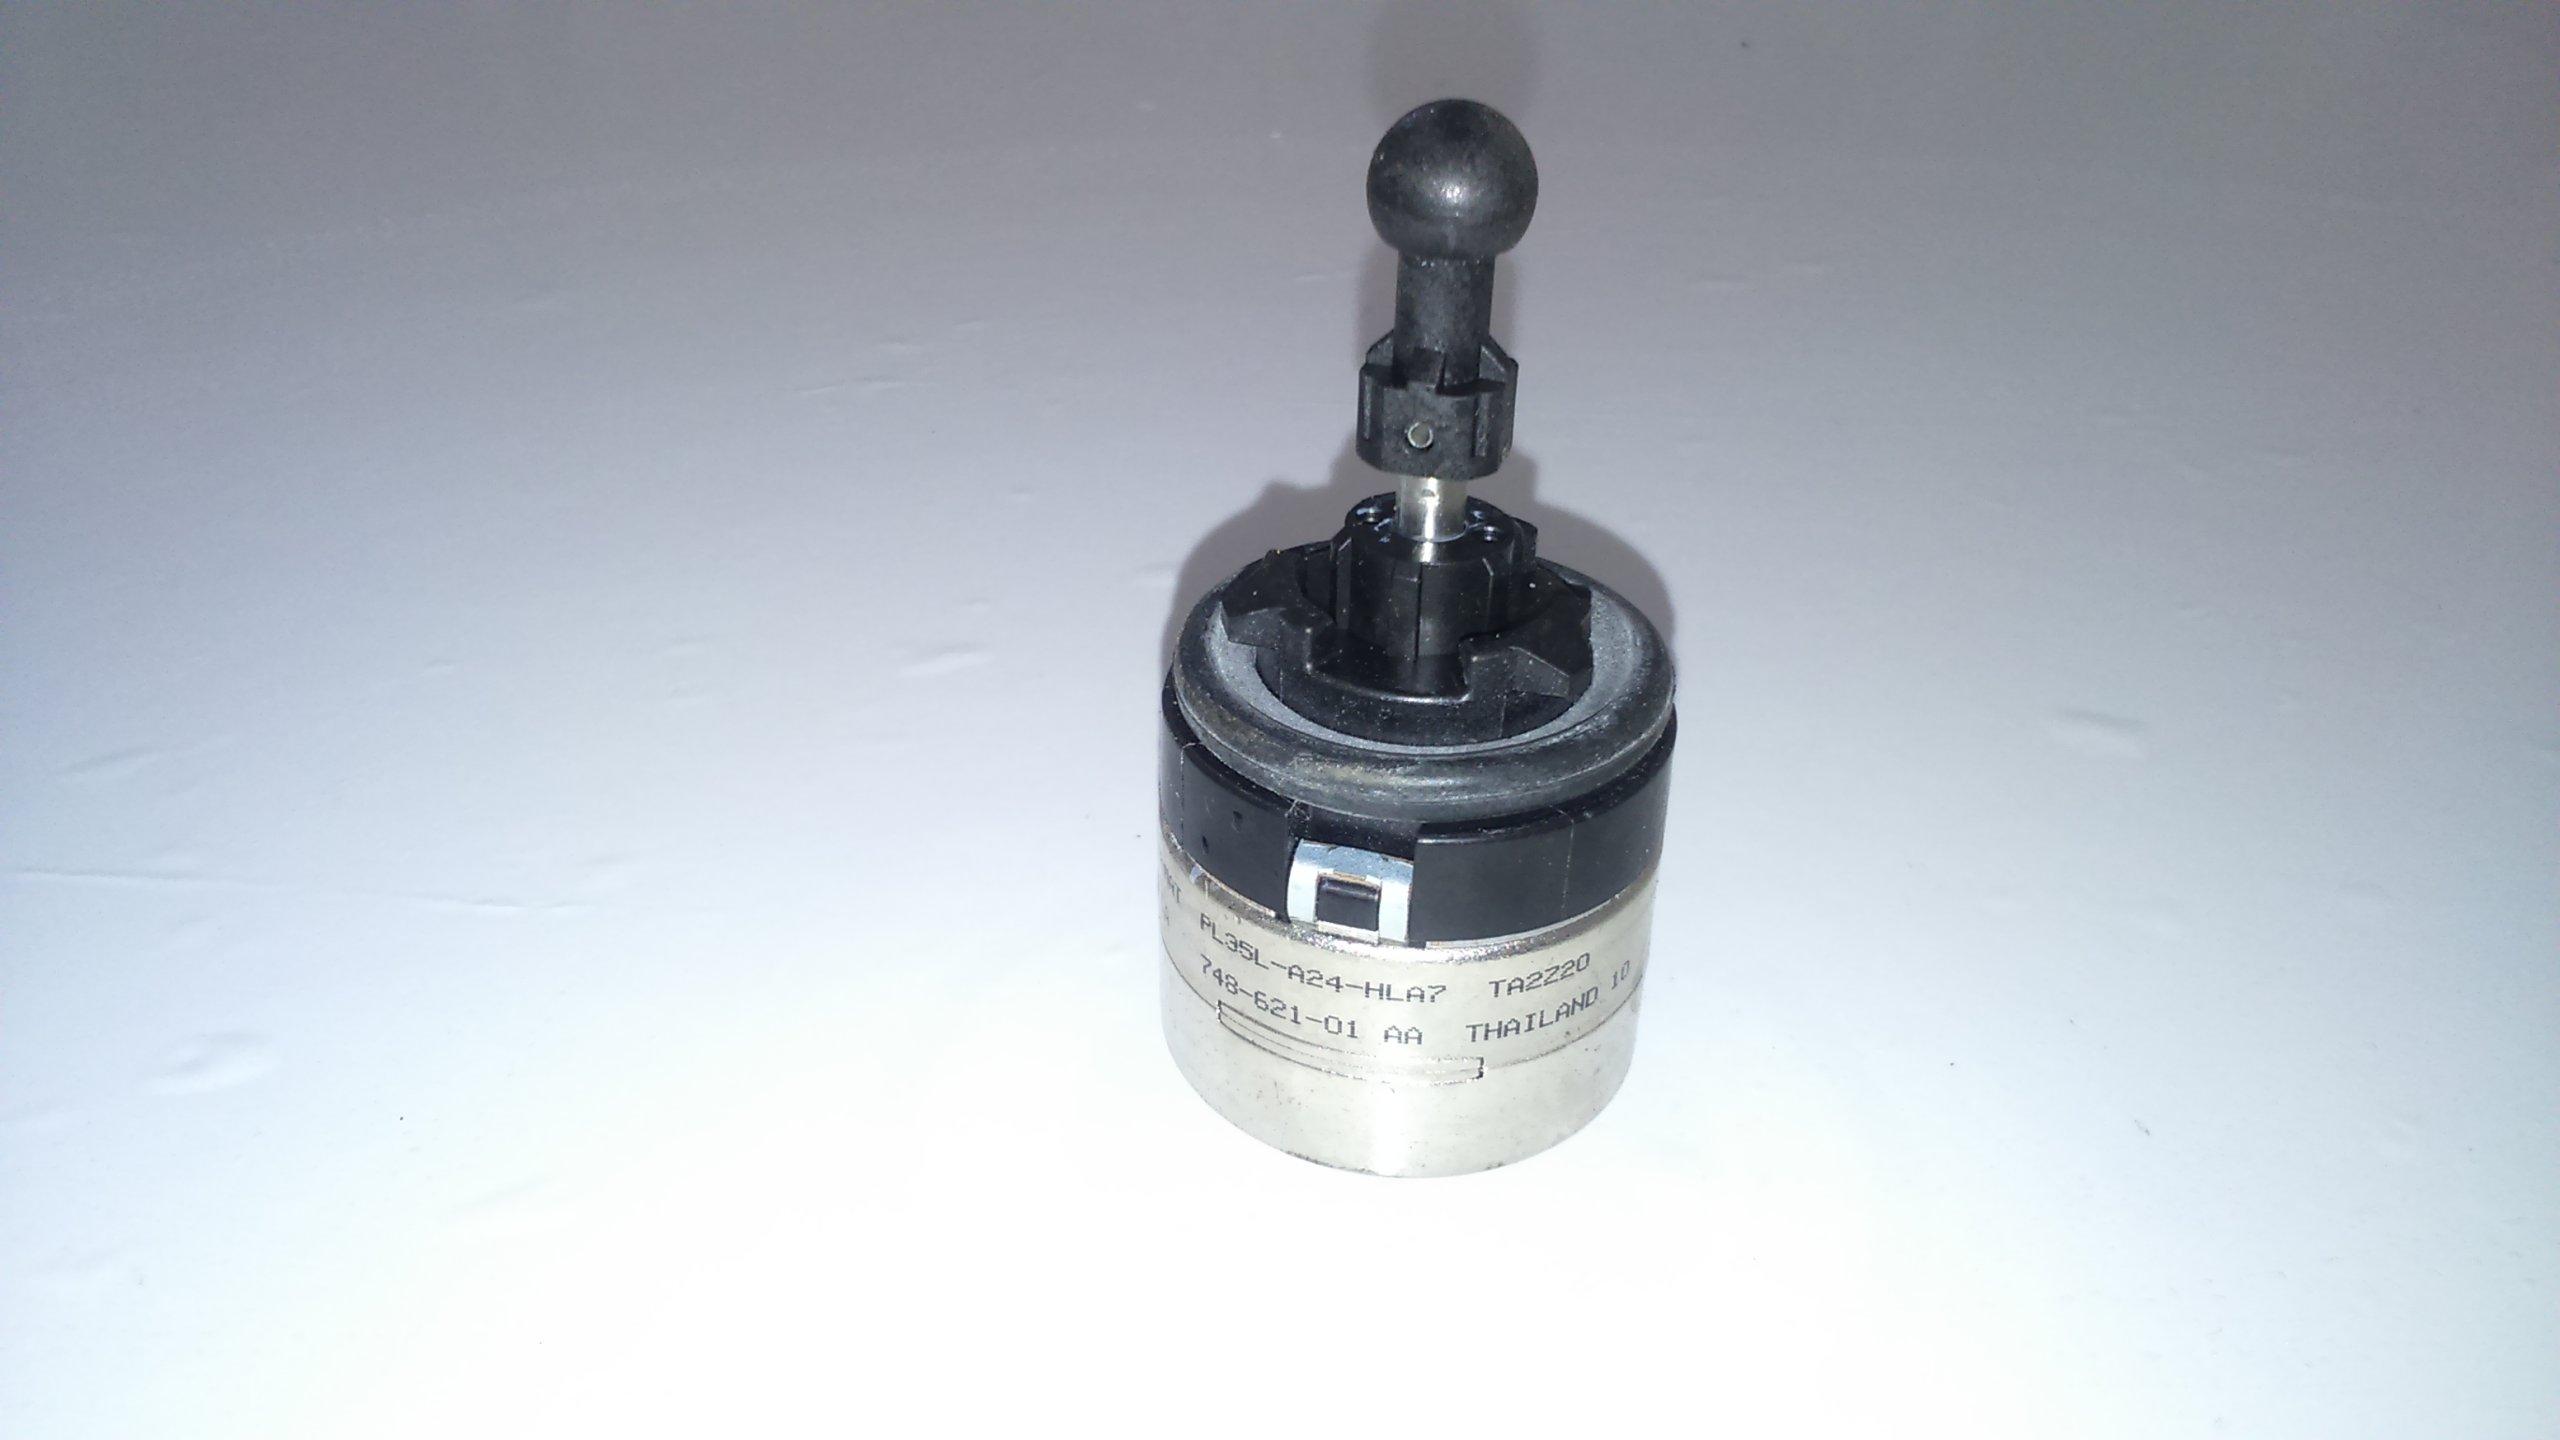 SILNICZEK REGULACJI LAMPY AUDI A6 C7 74862101AA